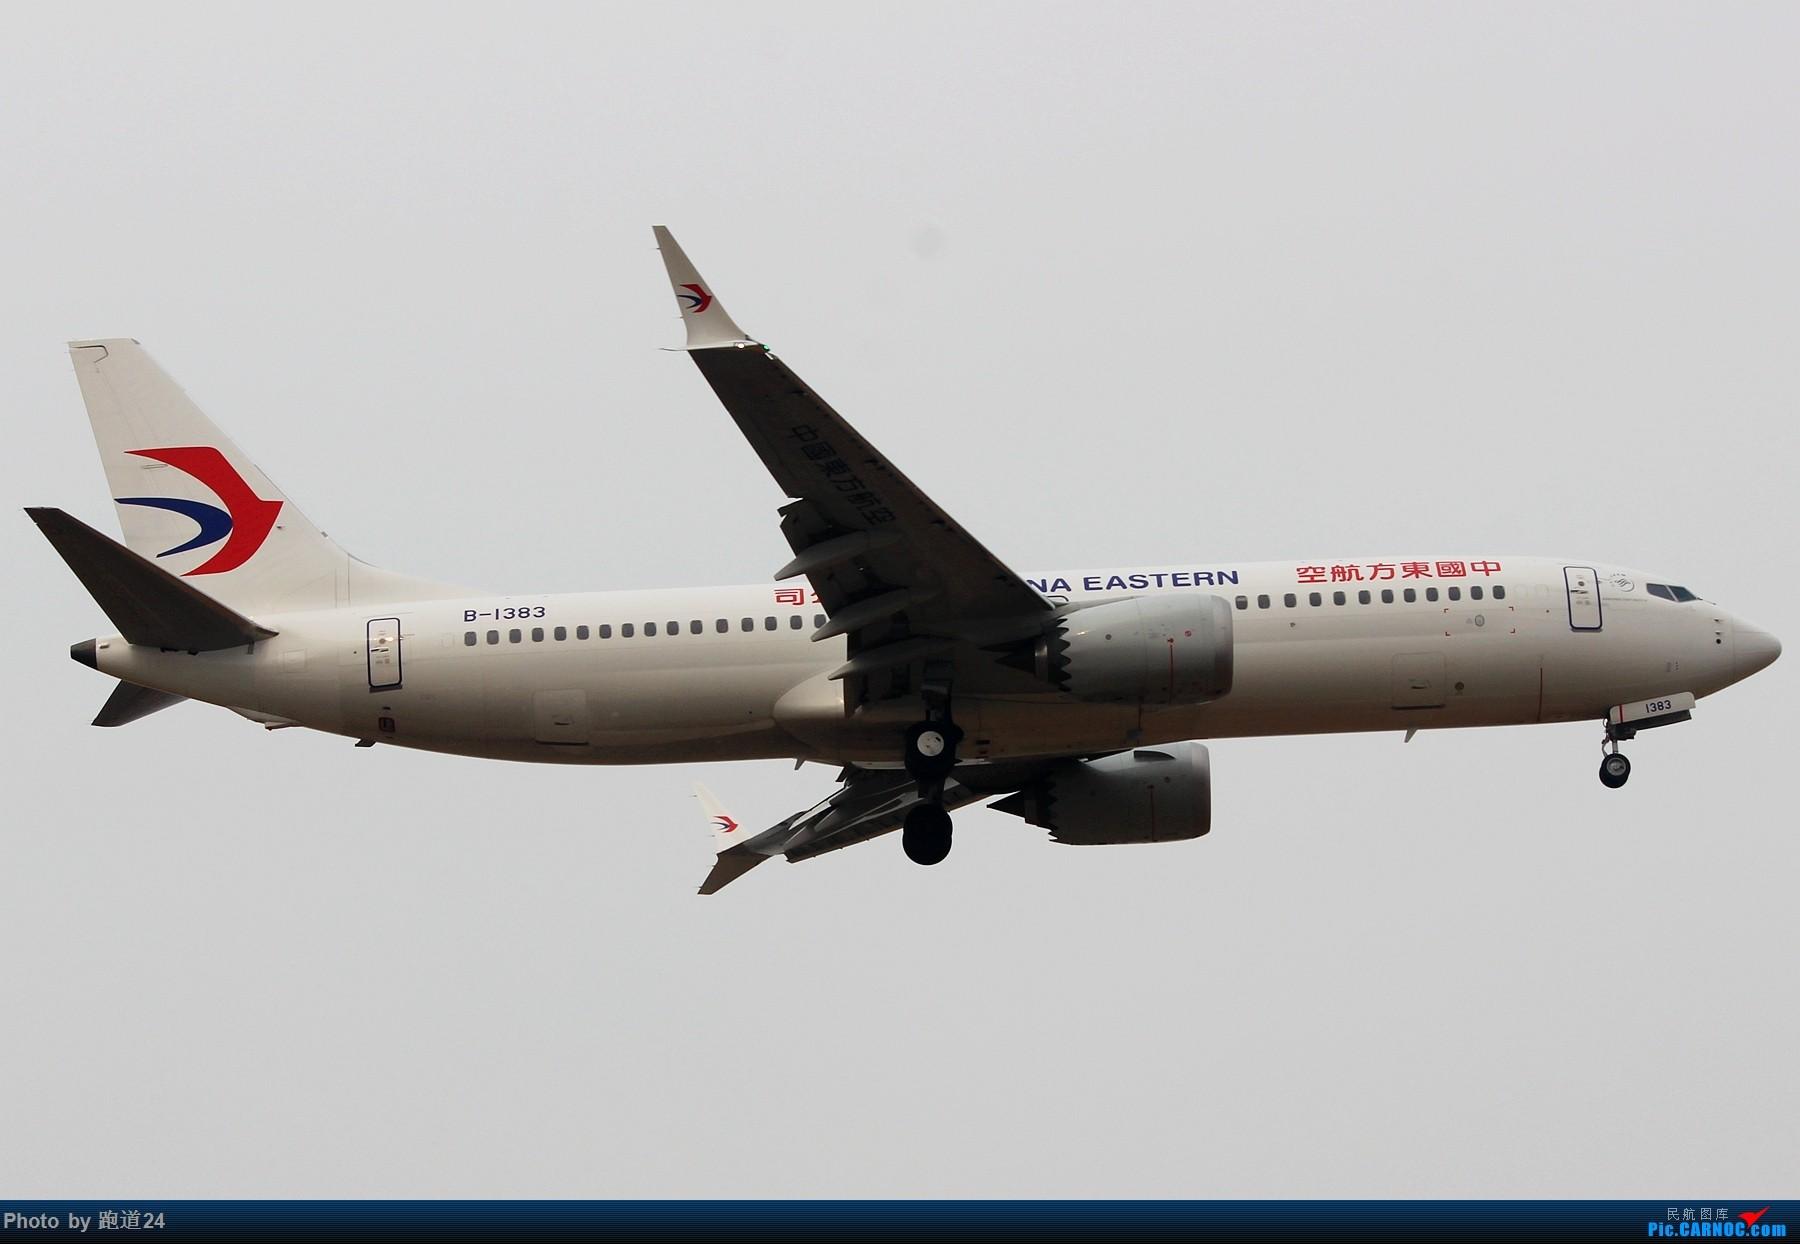 Re:[原创]3月2日CTU拍机[国航748 东方73M 红河水乡等] BOEING 737MAX-8 B-1383 中国成都双流国际机场